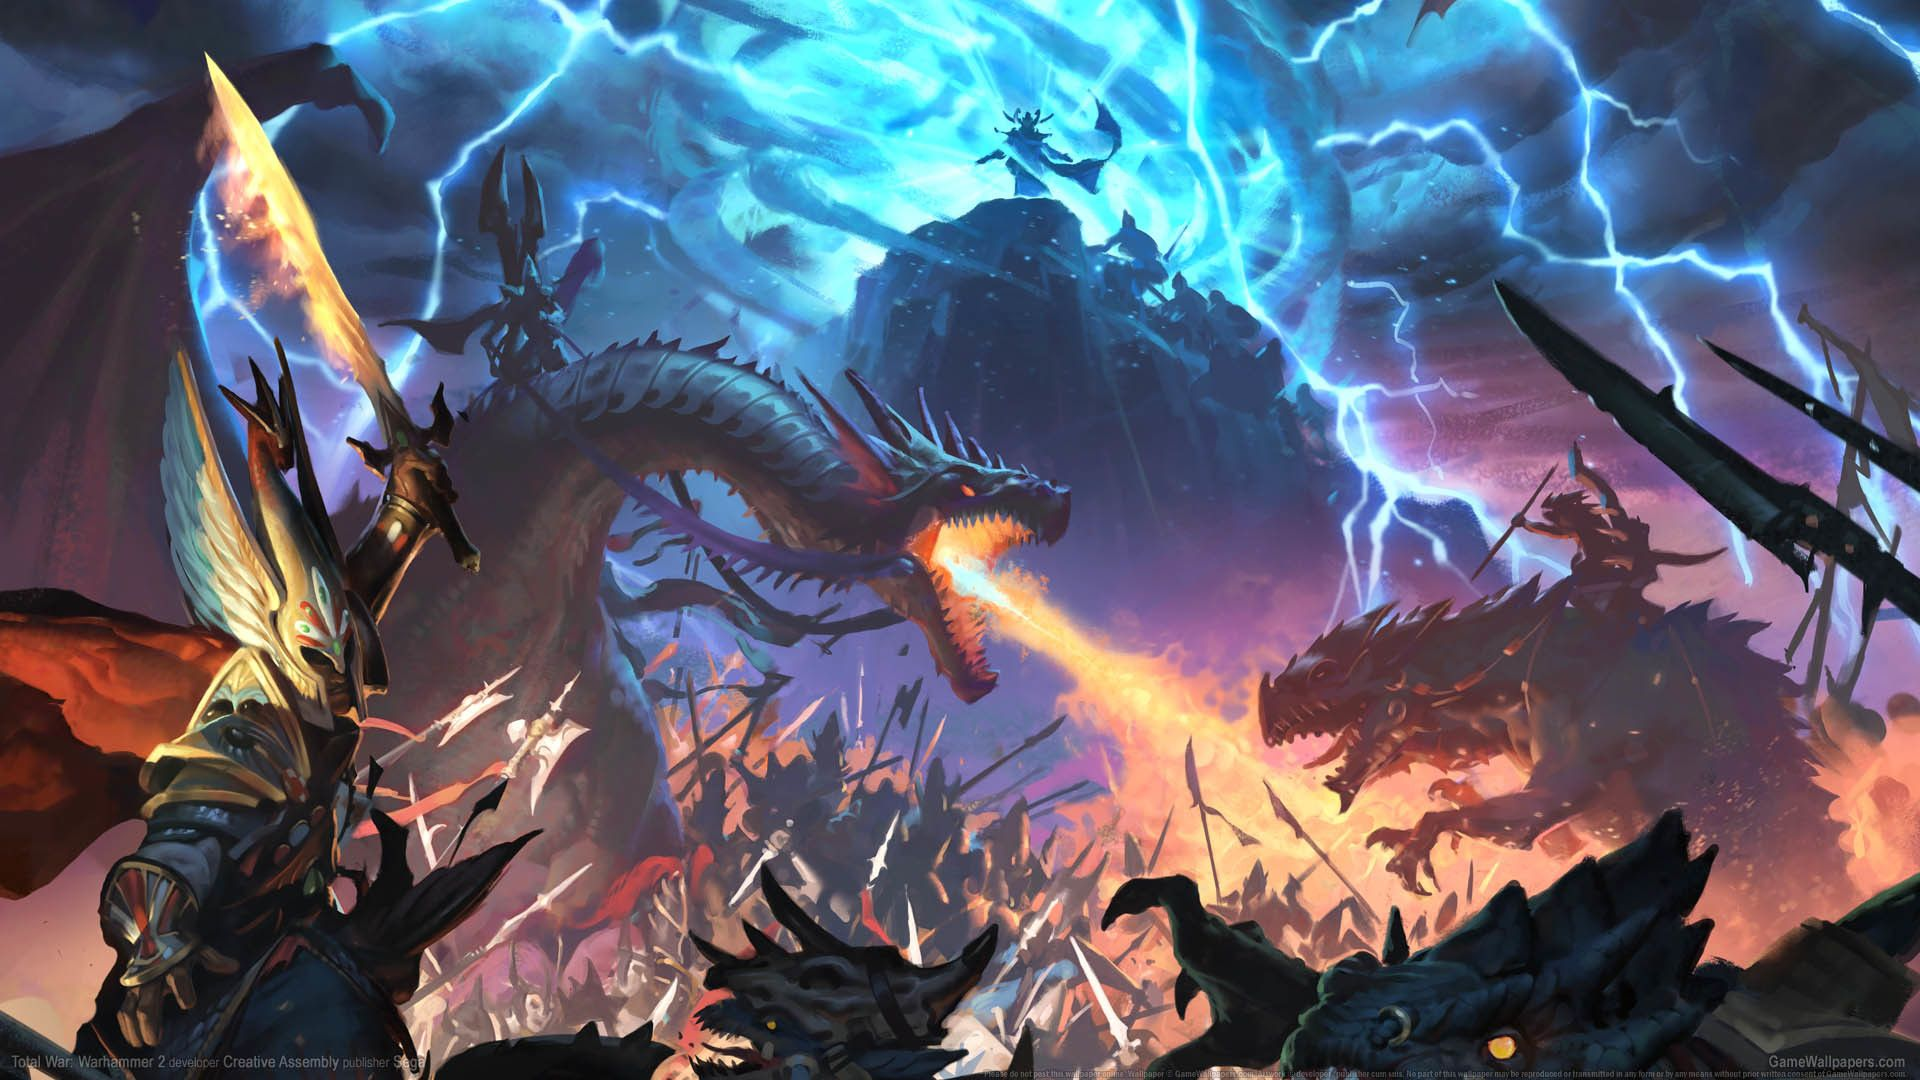 Warhammer Fantasy Wallpapers Top Free Warhammer Fantasy